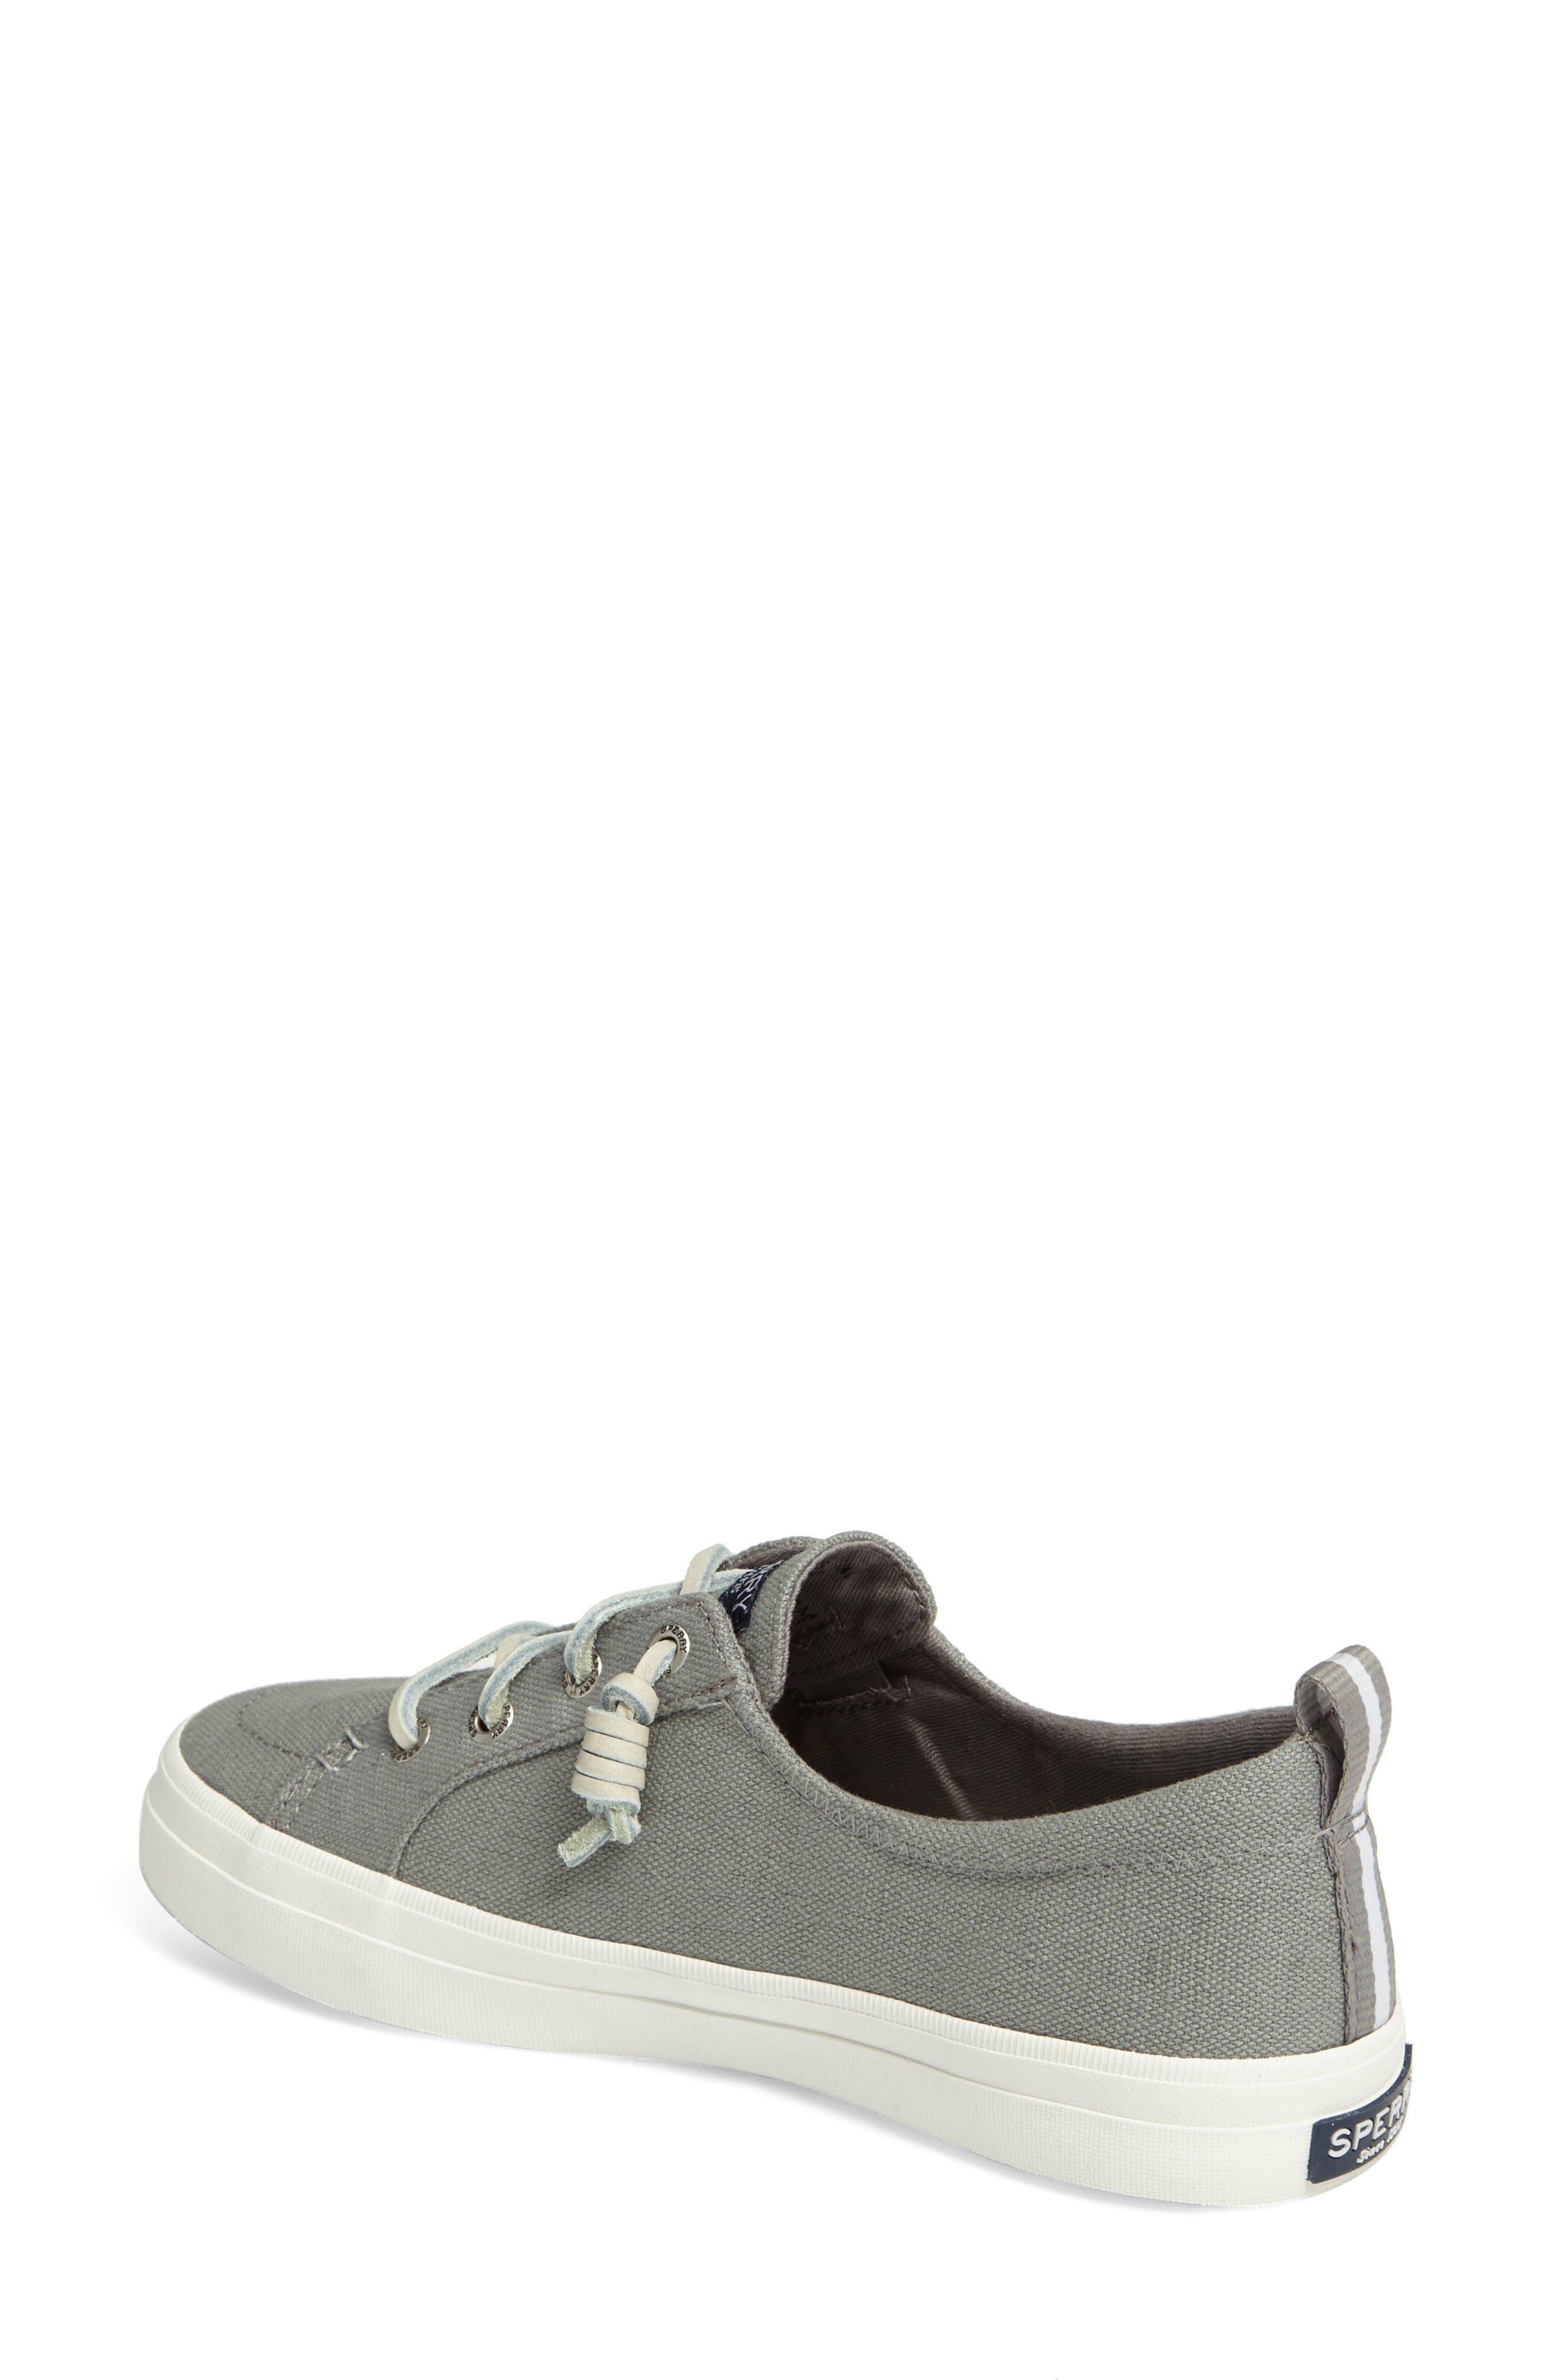 Crest Vibe Sneaker,                             Alternate thumbnail 2, color,                             Grey Canvas